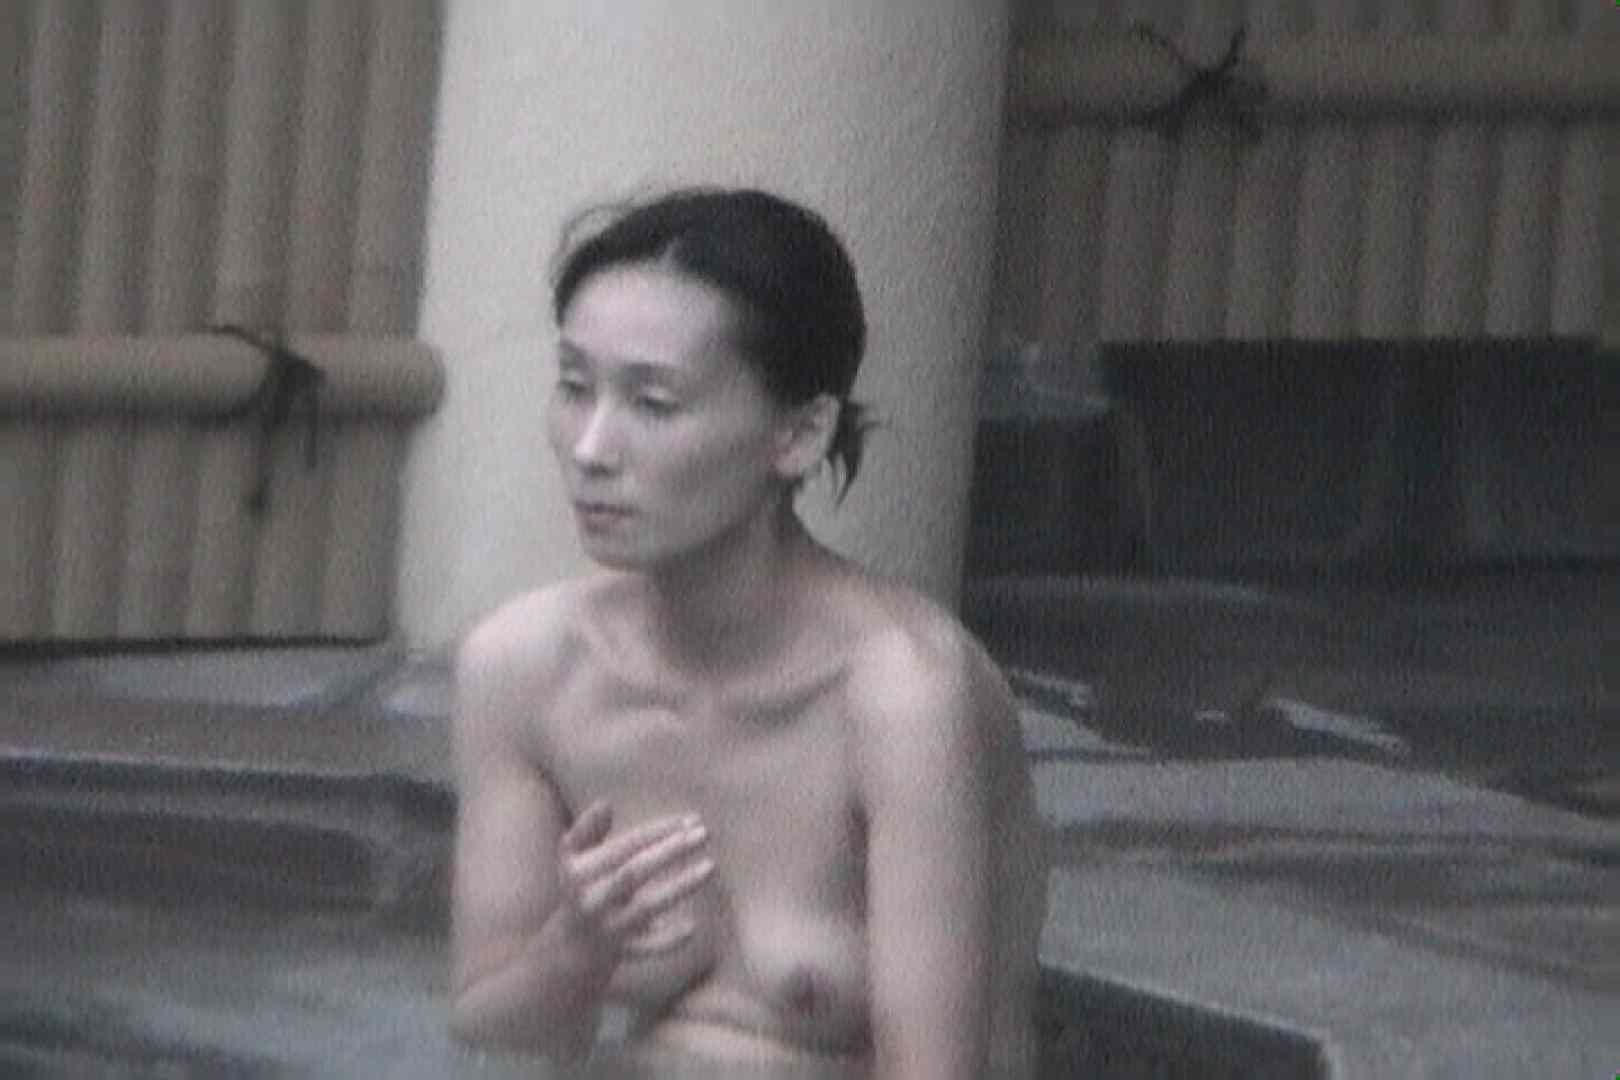 Aquaな露天風呂Vol.557 露天風呂編 | 盗撮シリーズ  100PIX 93